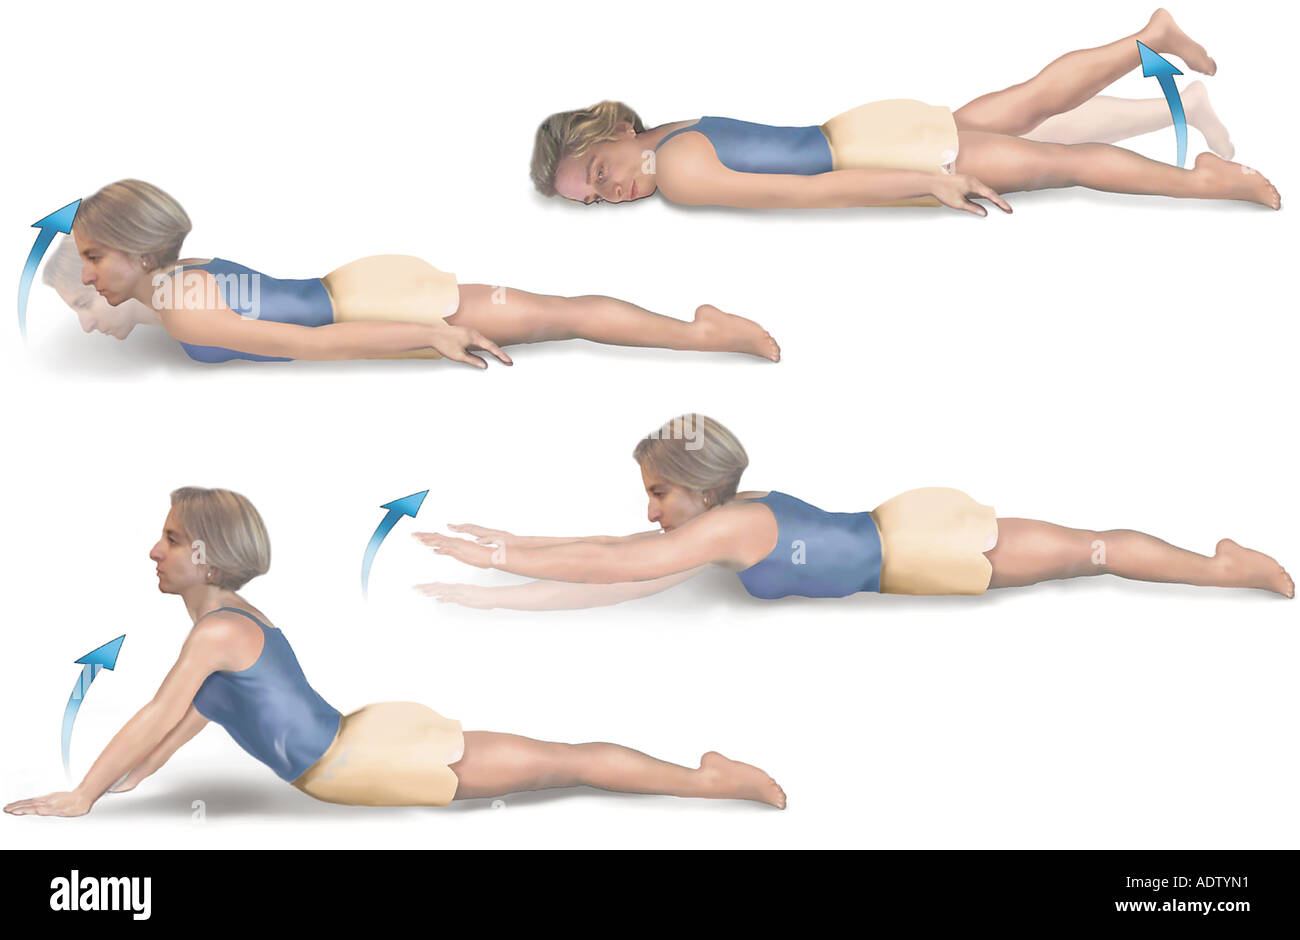 Ankylosing Spondylitis Prone Hip Extensor Exercise - Stock Image